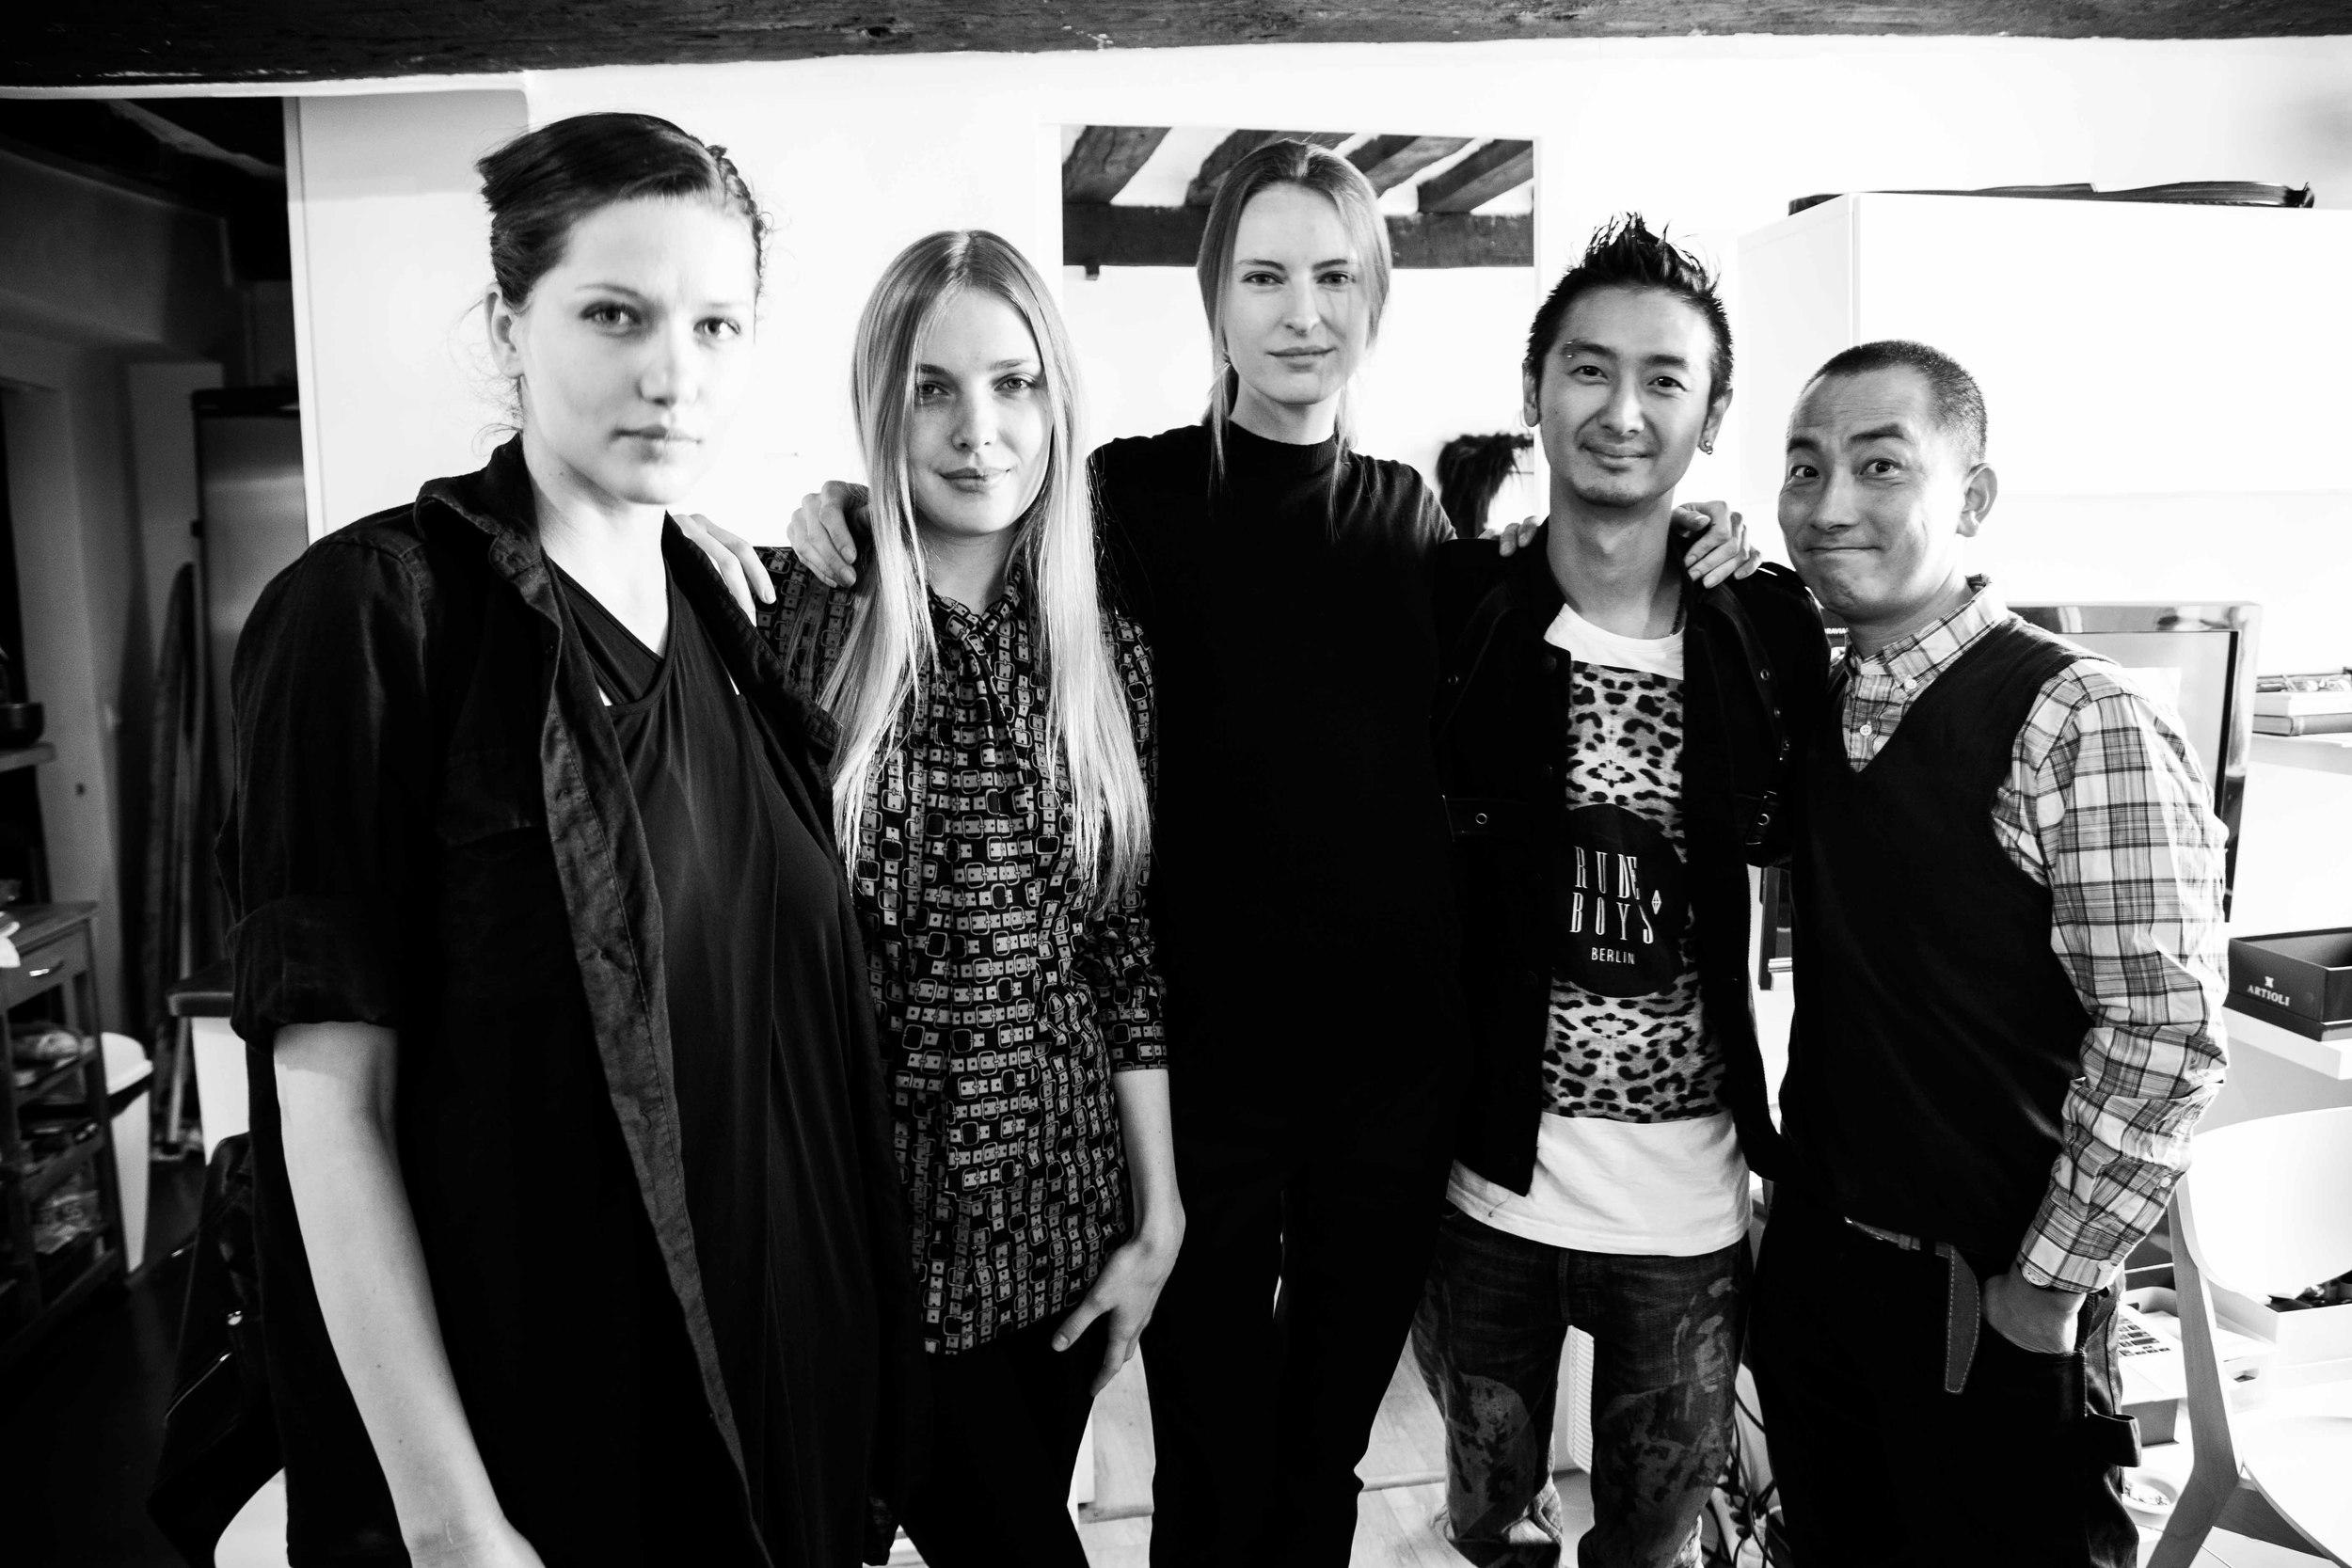 Left to Right: Mada @ Major Paris, Carmen, Laura @ Just WM, Moi and Kenji.